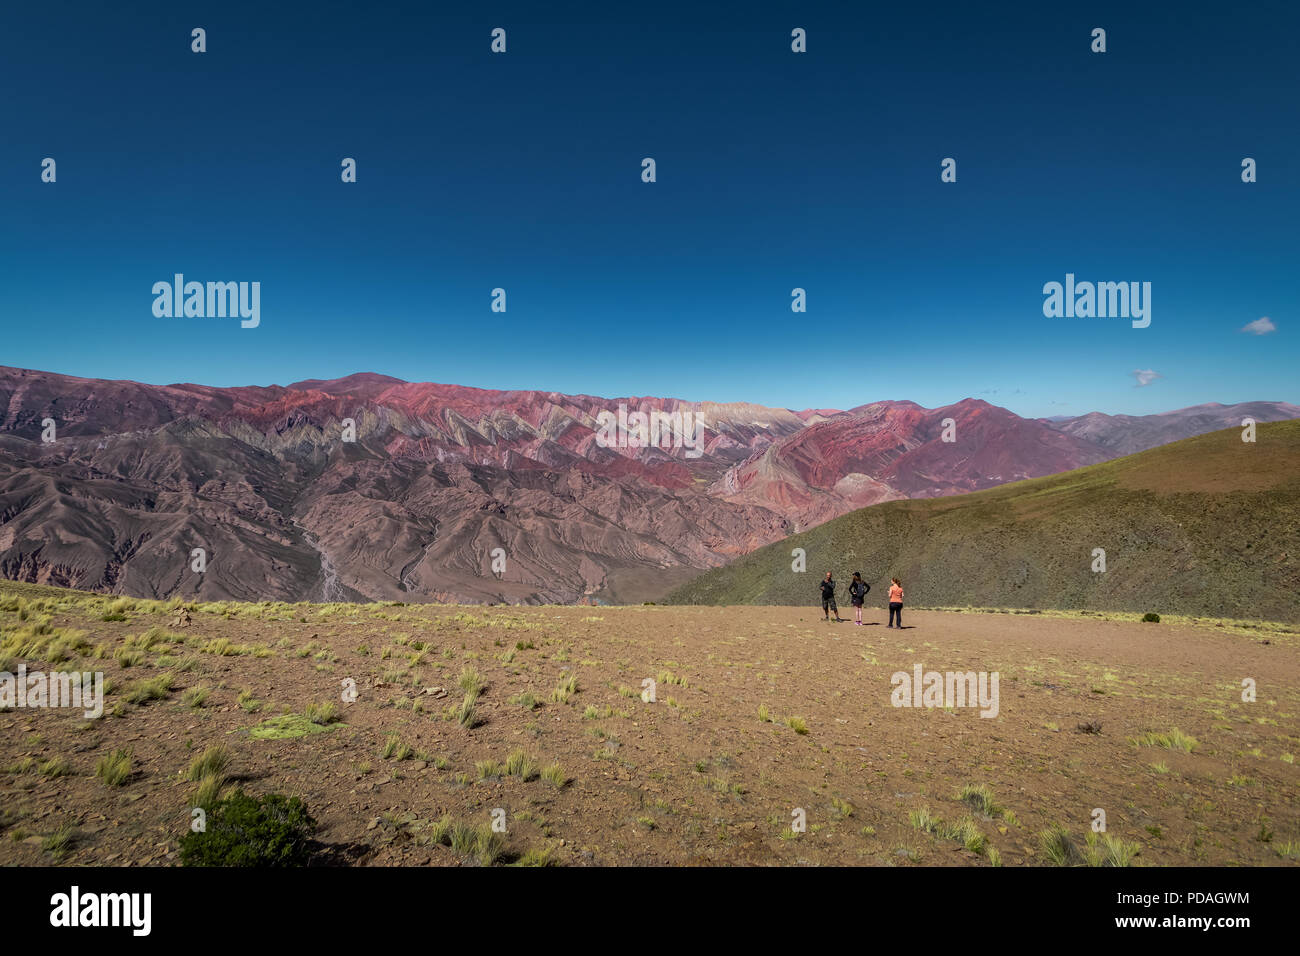 Serrania de Hornocal, the fourteen colors hill at Quebrada de Humahuaca - Humahuaca, Jujuy, Argentina - Stock Image